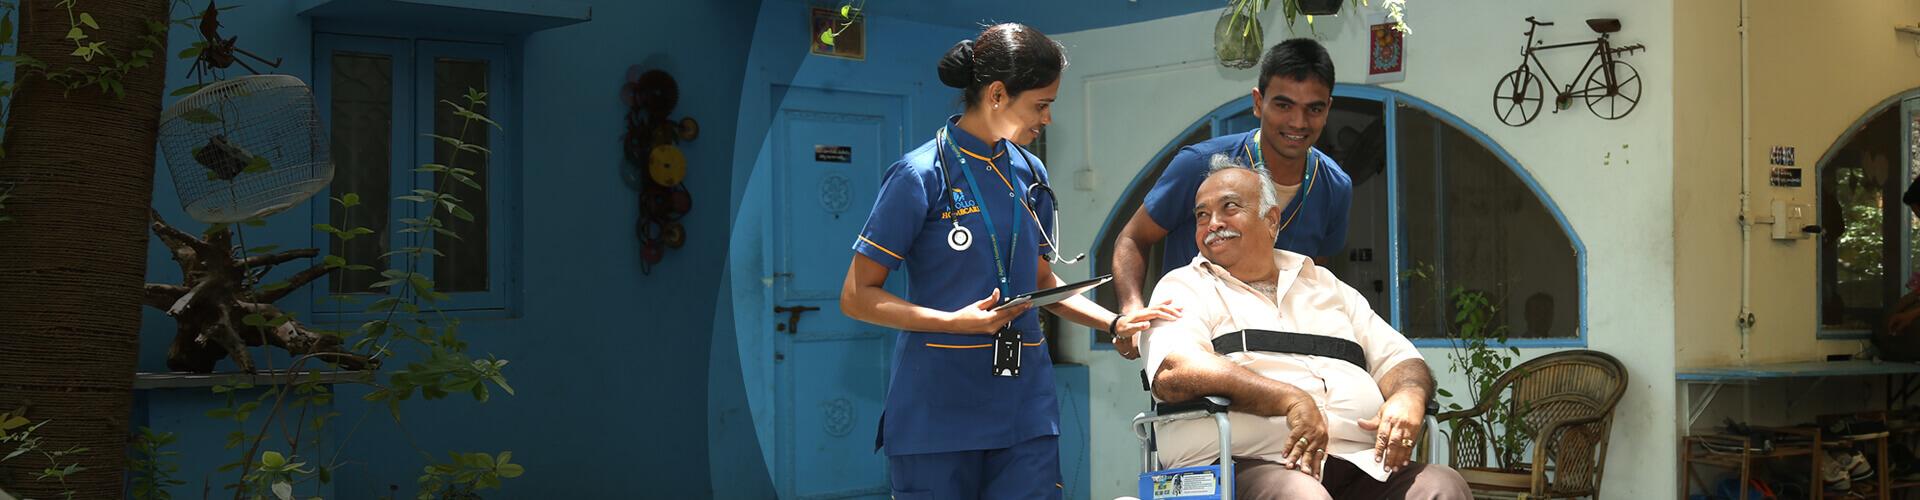 ⭐ Apollo HomeCare Quality Healthcare at Home